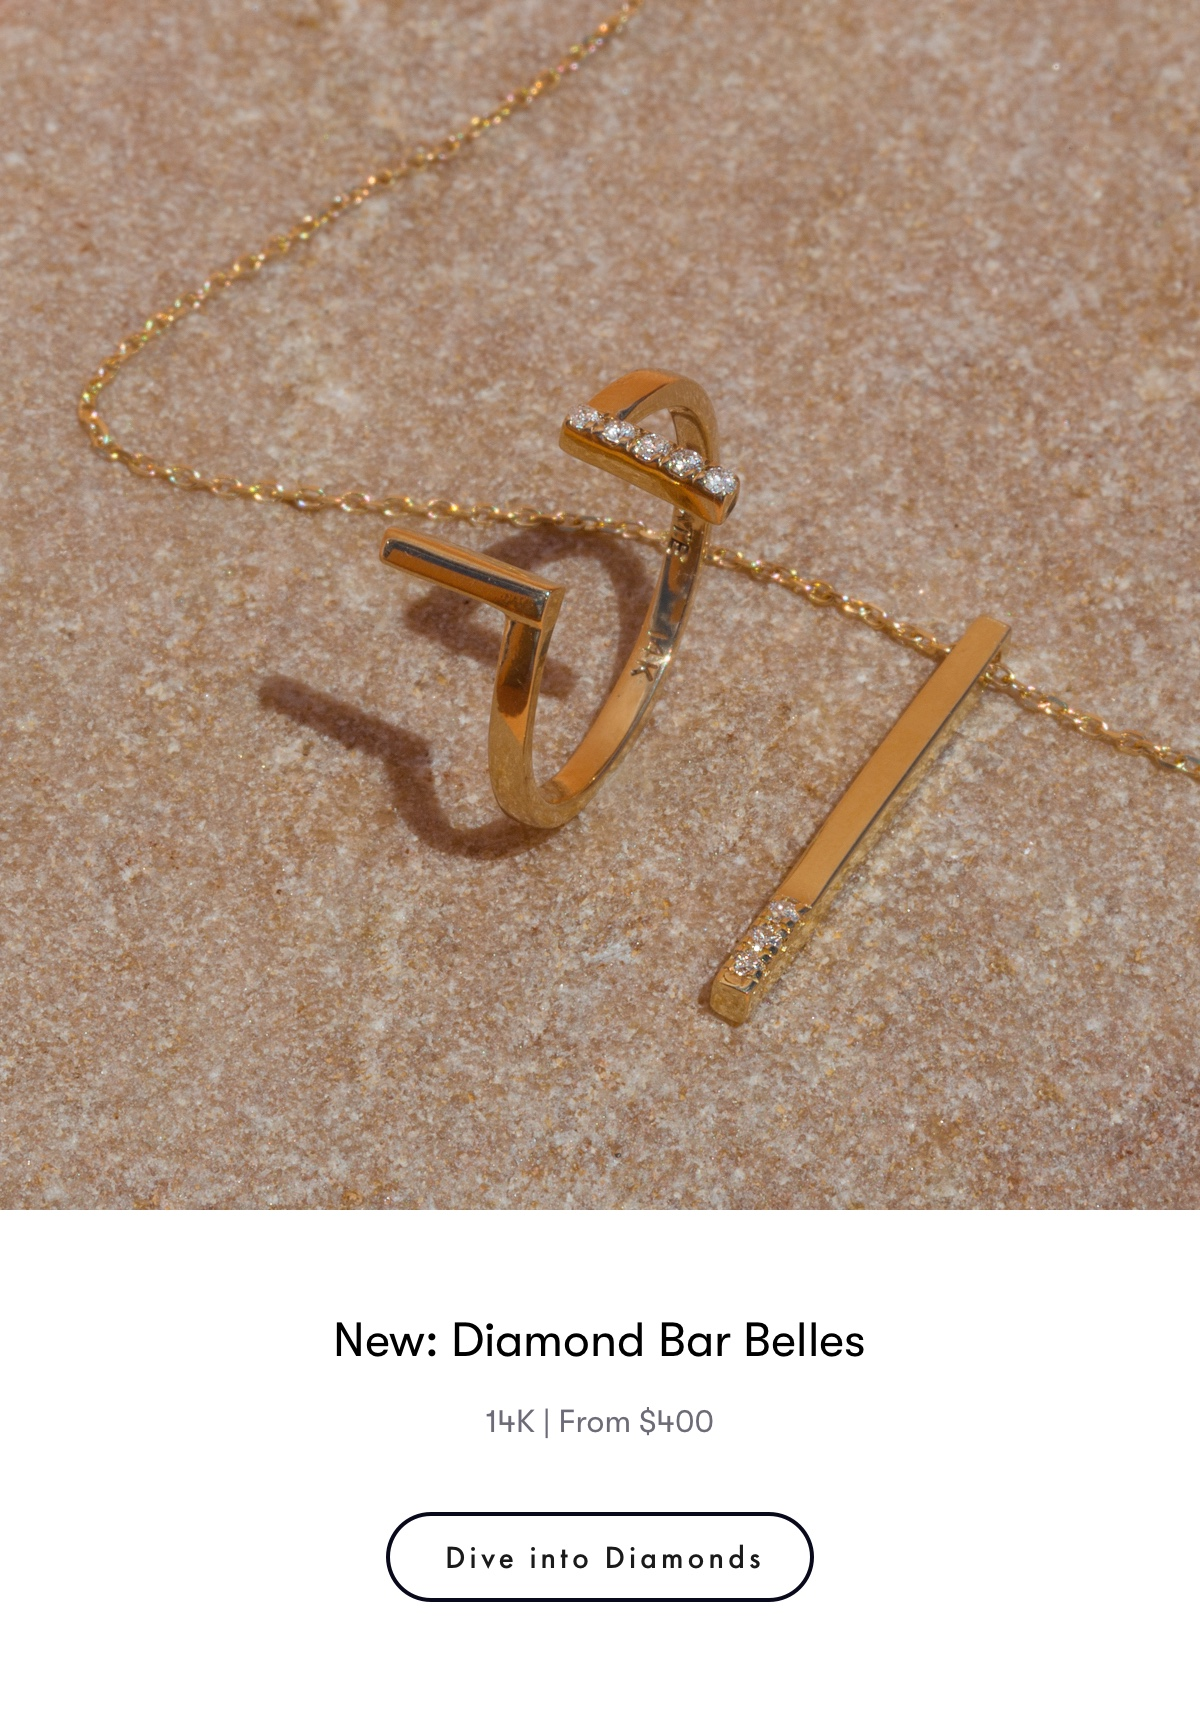 diamond bar belles